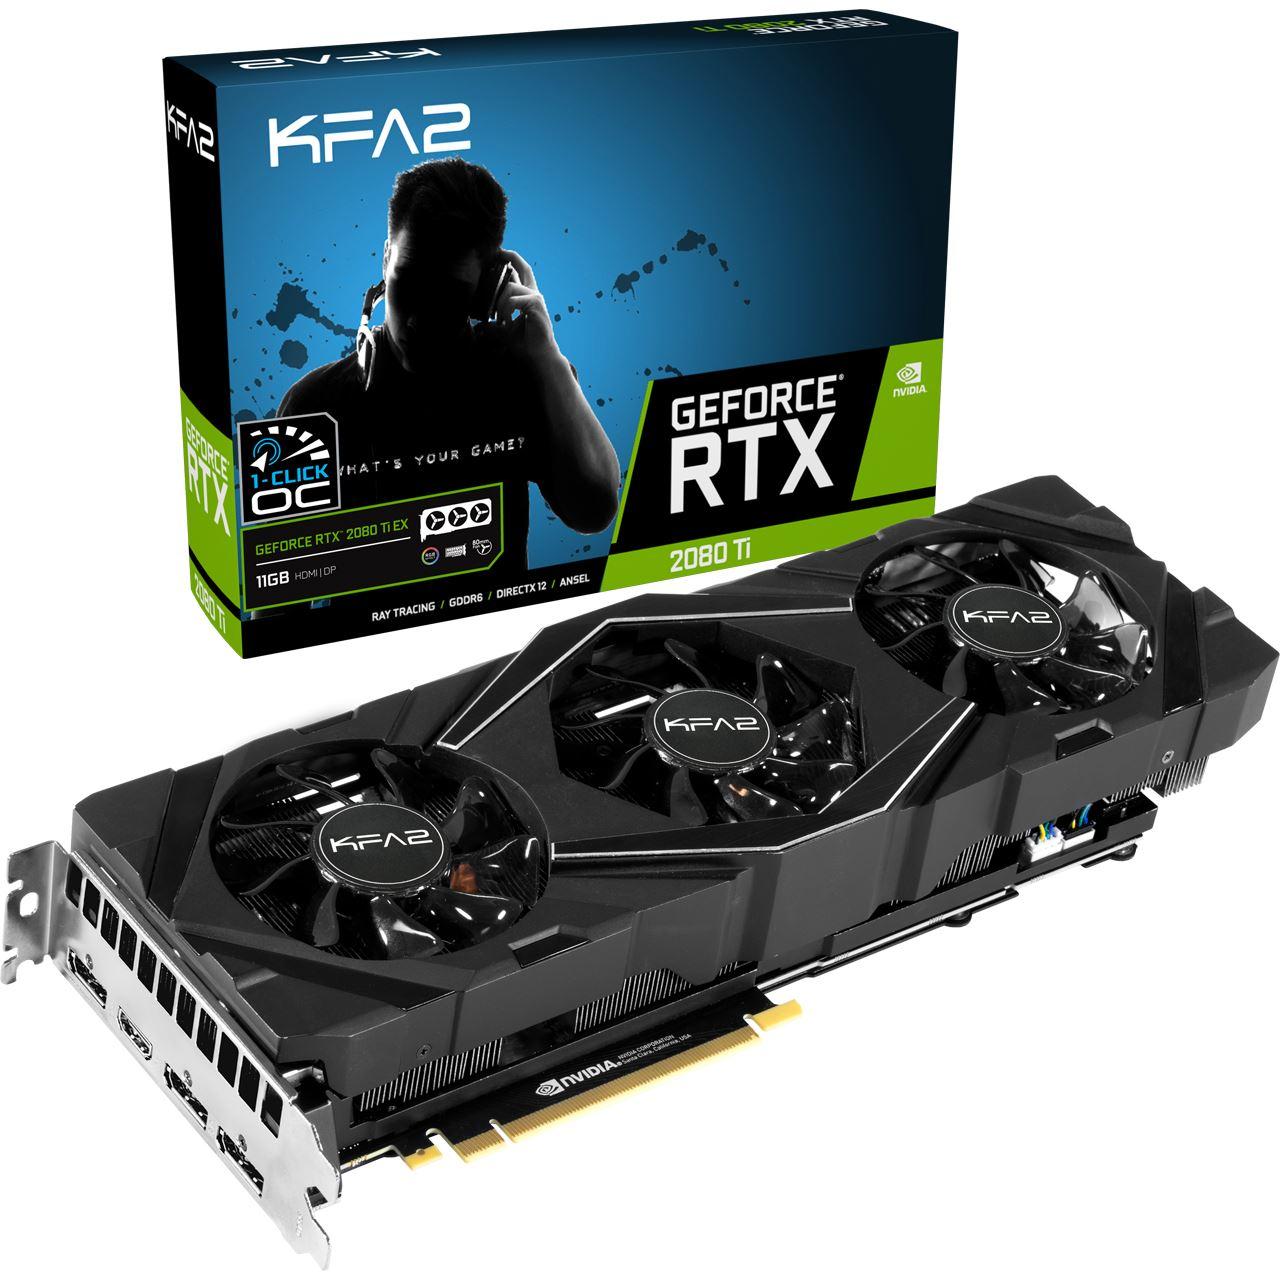 KFA2 GeForce RTX 2080 Ti EX 11GB